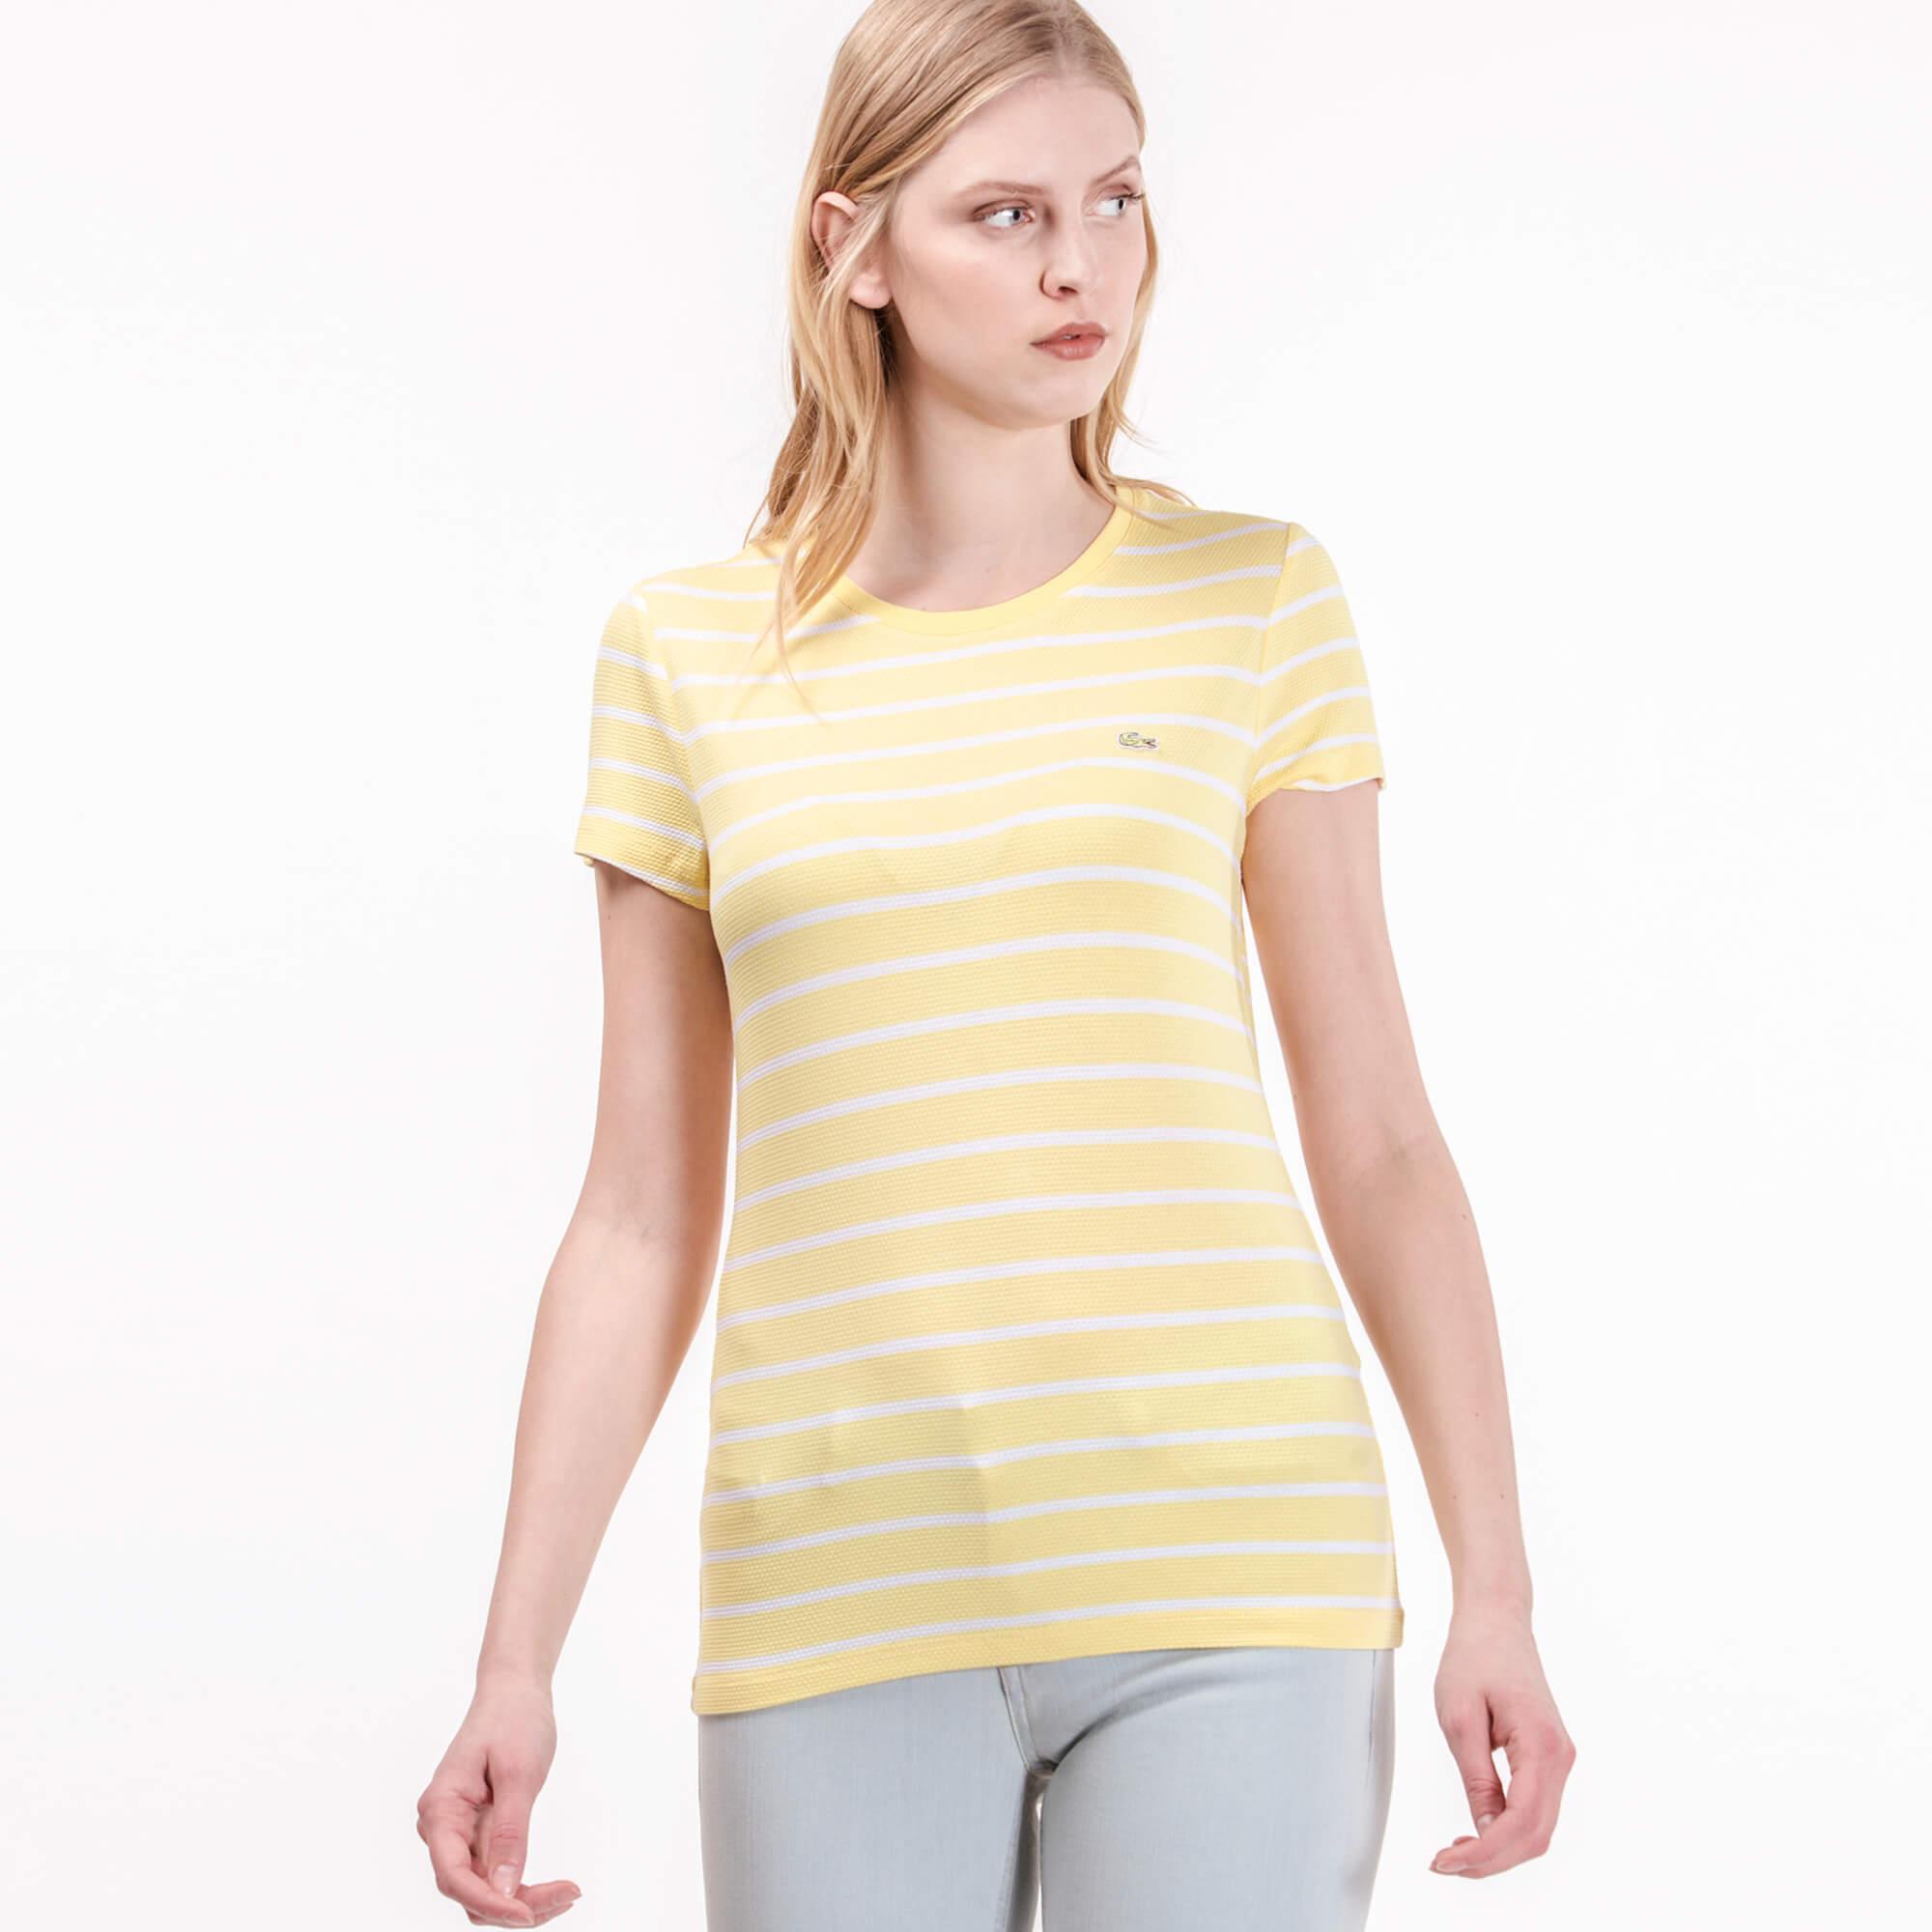 Lacoste Kadın Çizgili Sarı T-Shirt